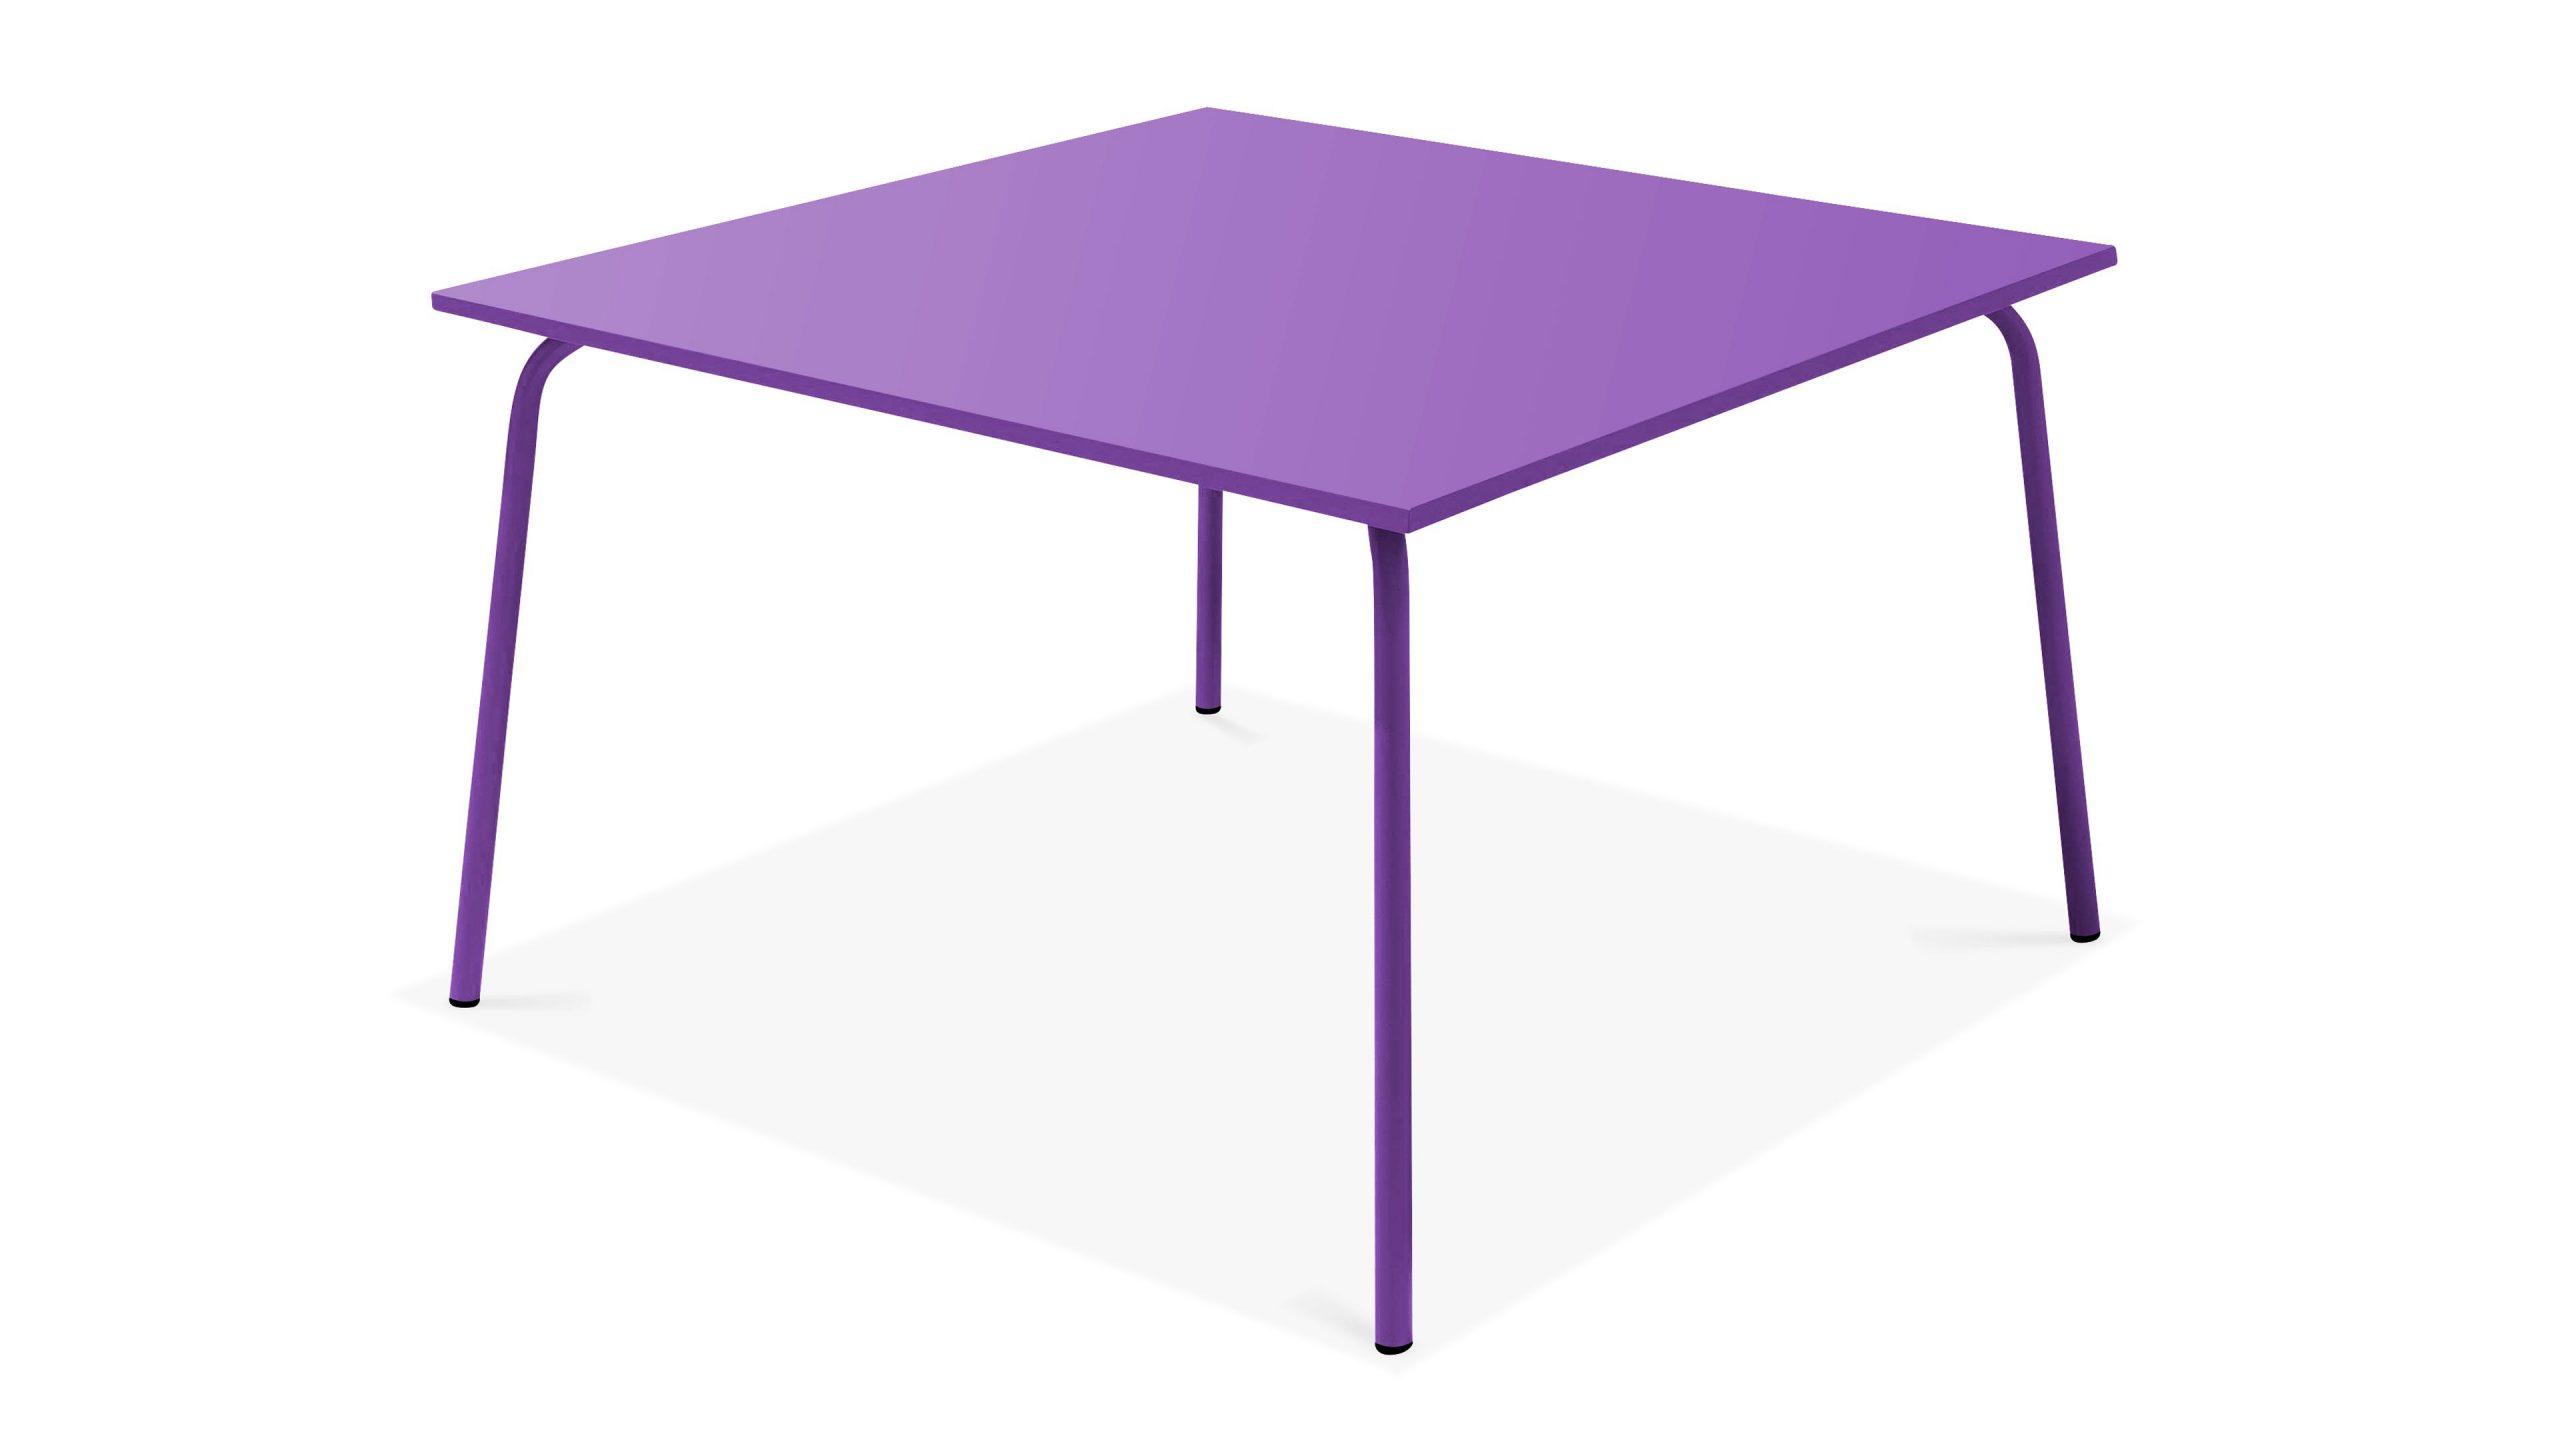 Table De Jardin Carrée En Acier 8 Places | Oviala serapportantà Table De Jardin Carrée 8 Personnes